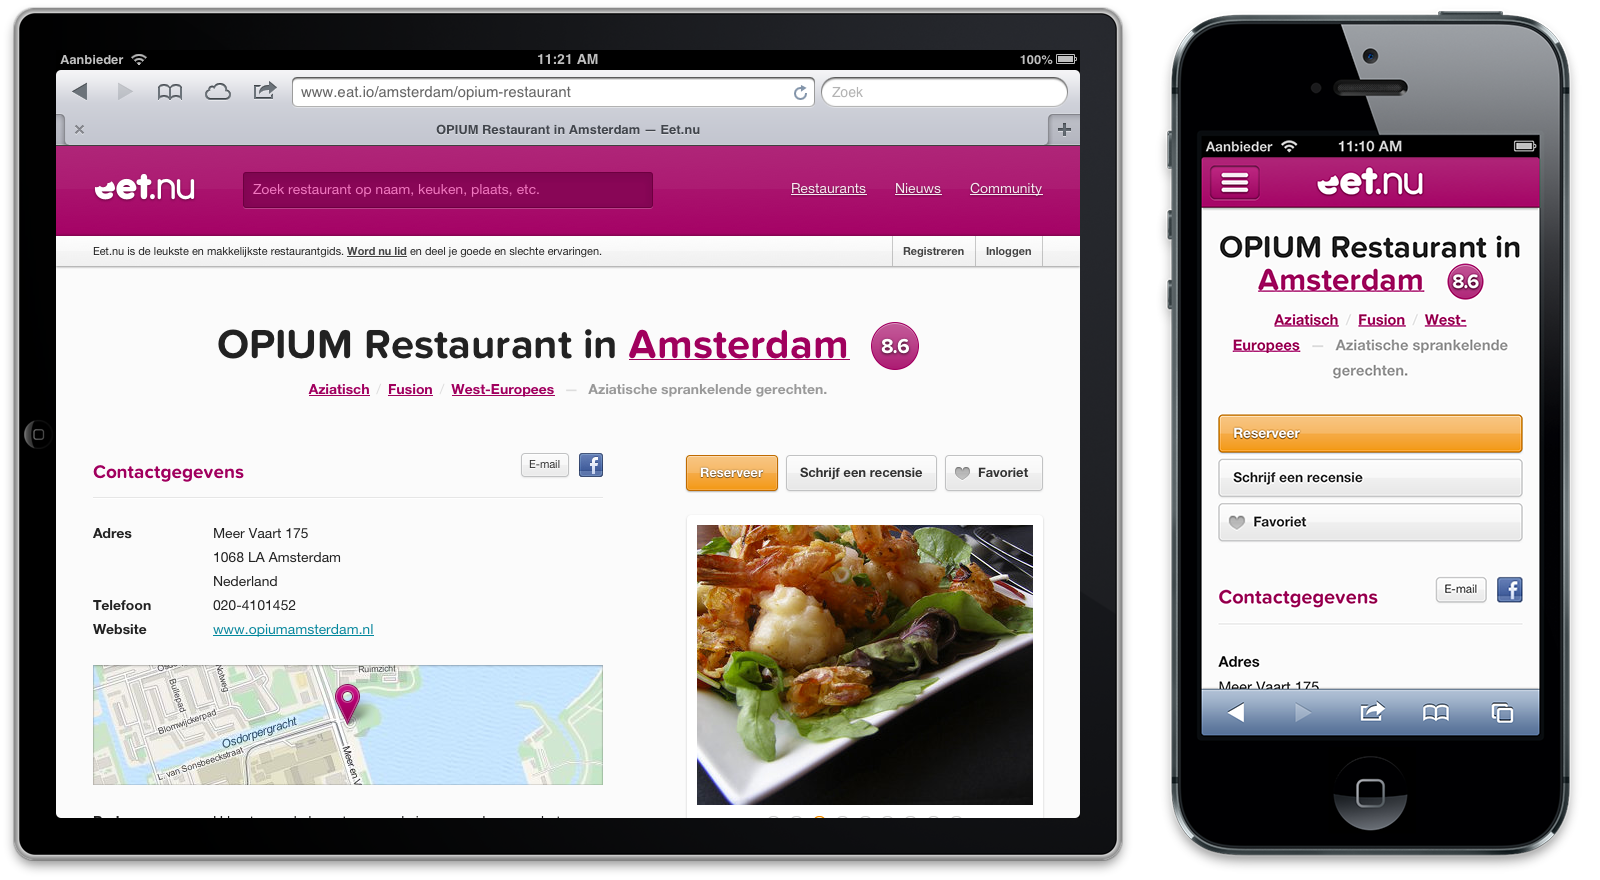 Tablet en telefoon restaurantpagina